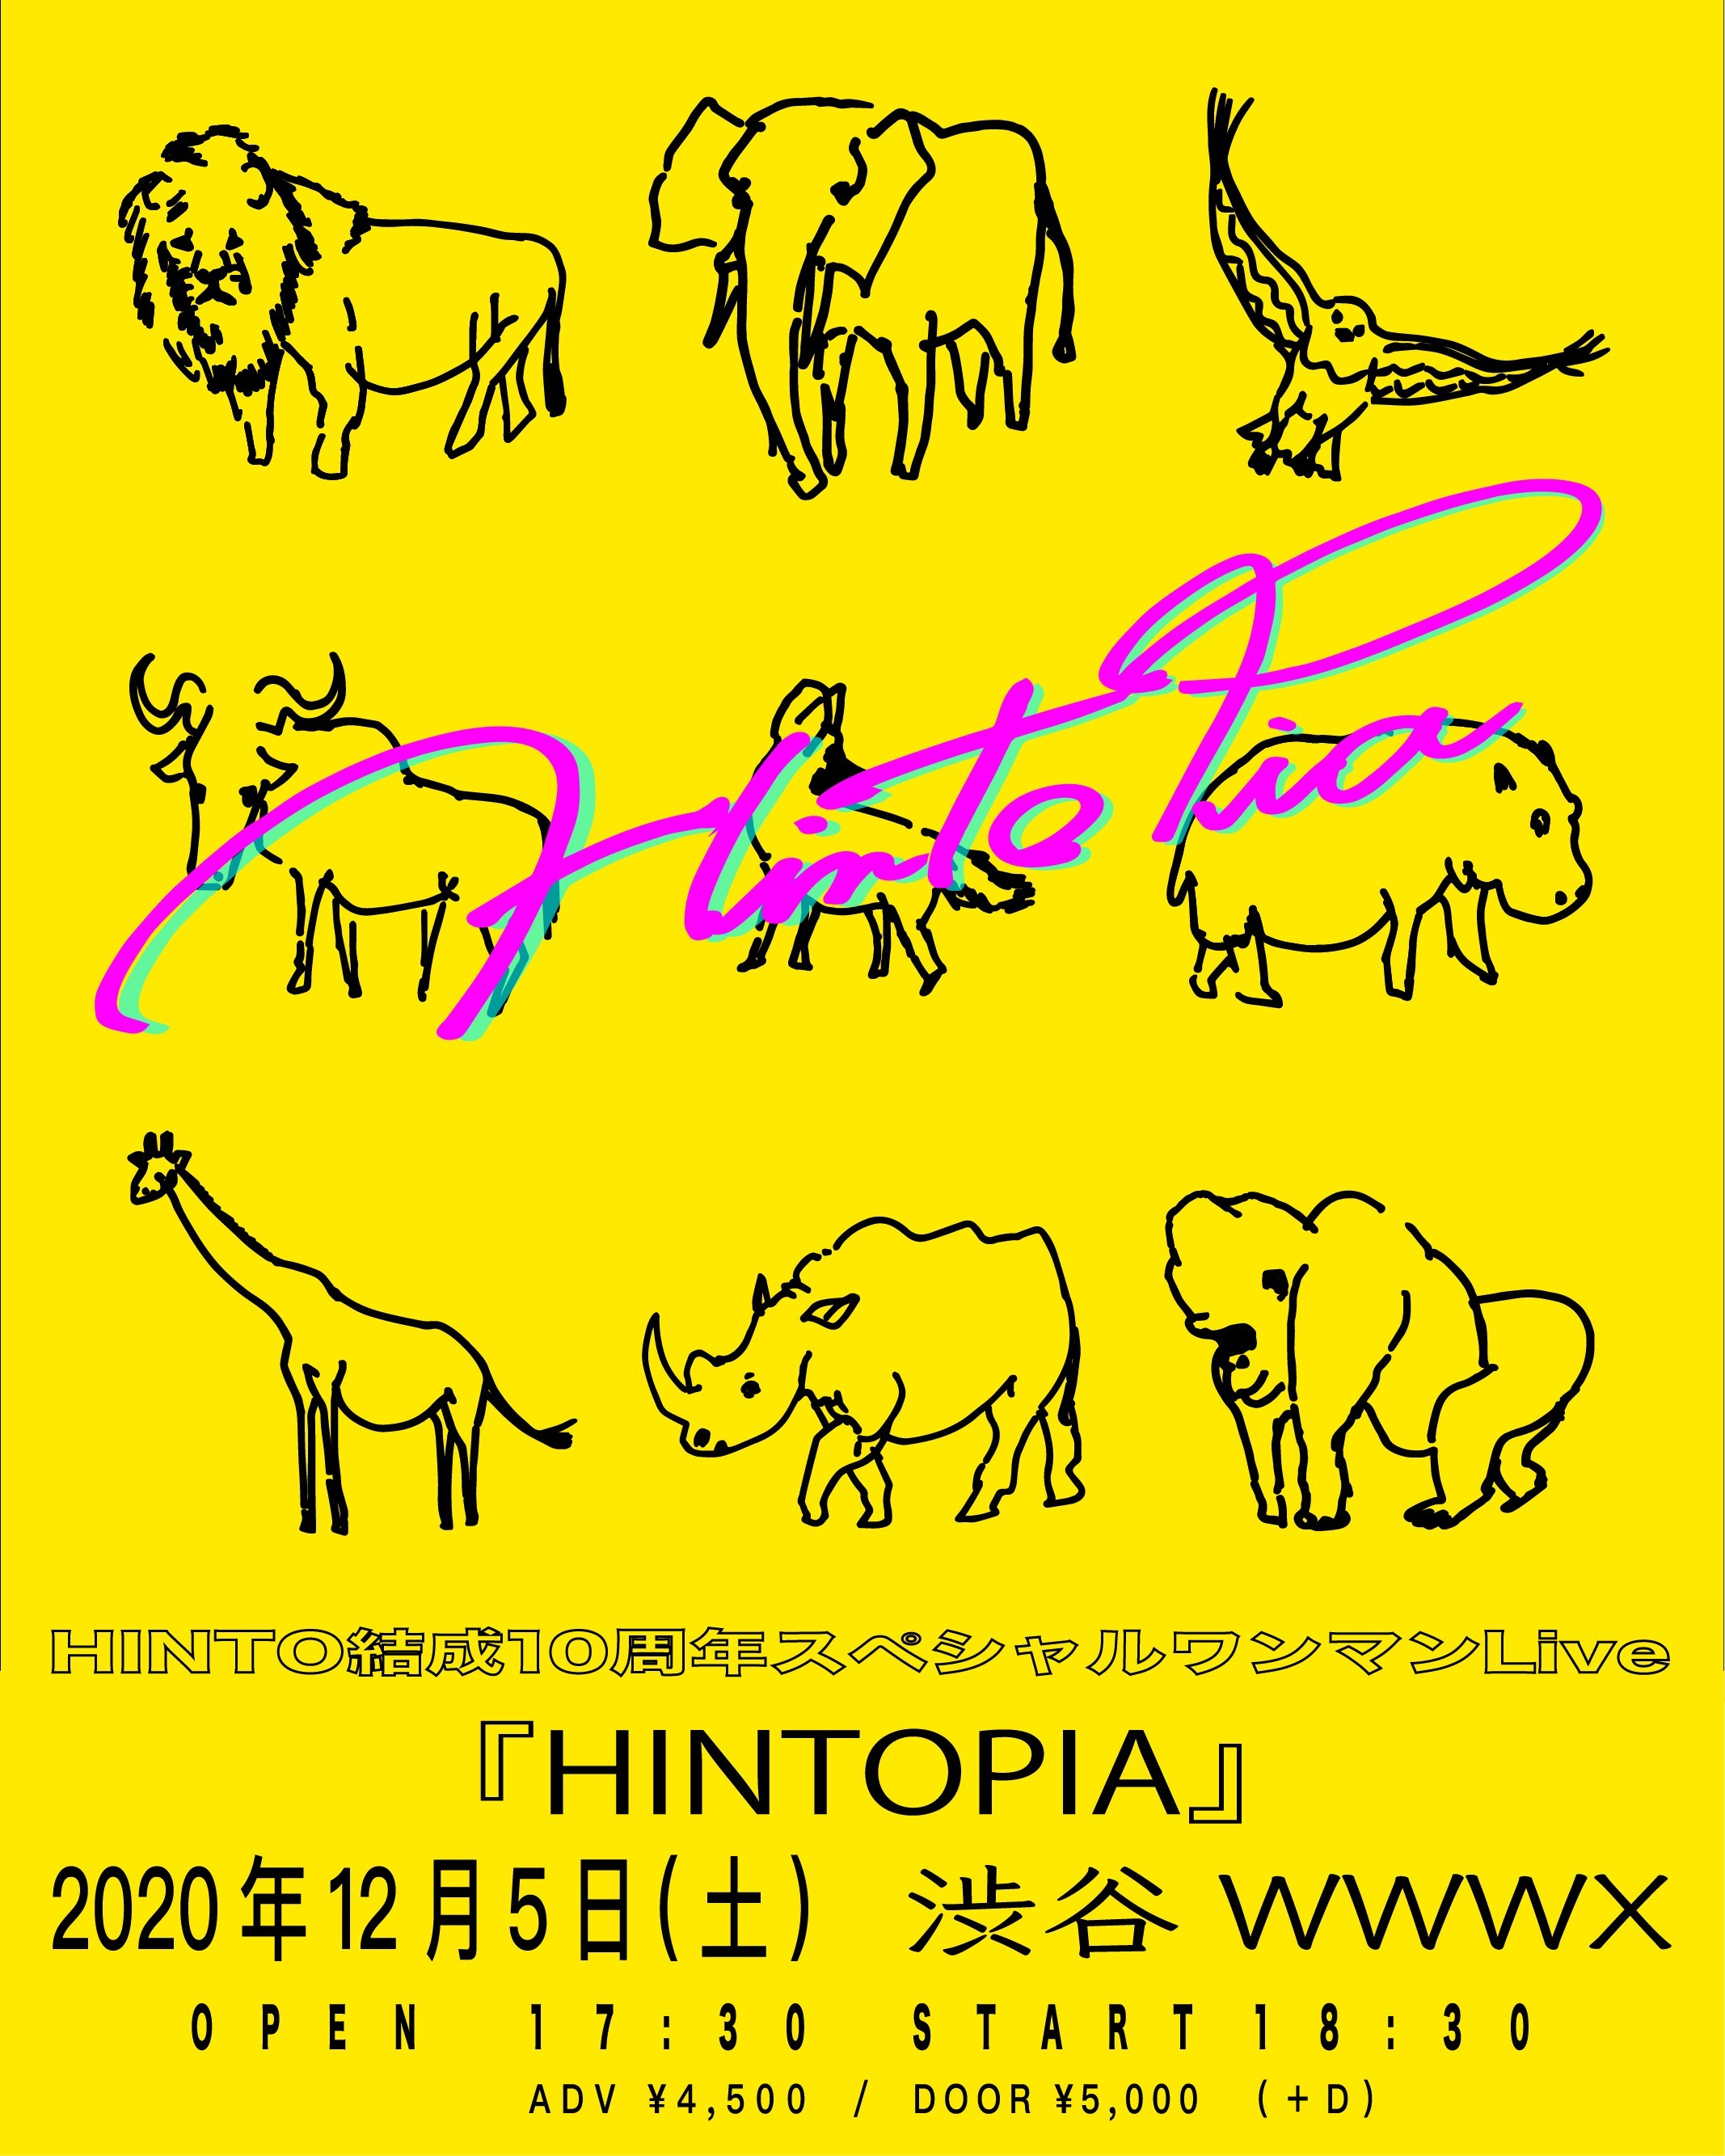 『HINTOPIA』告知フライヤー